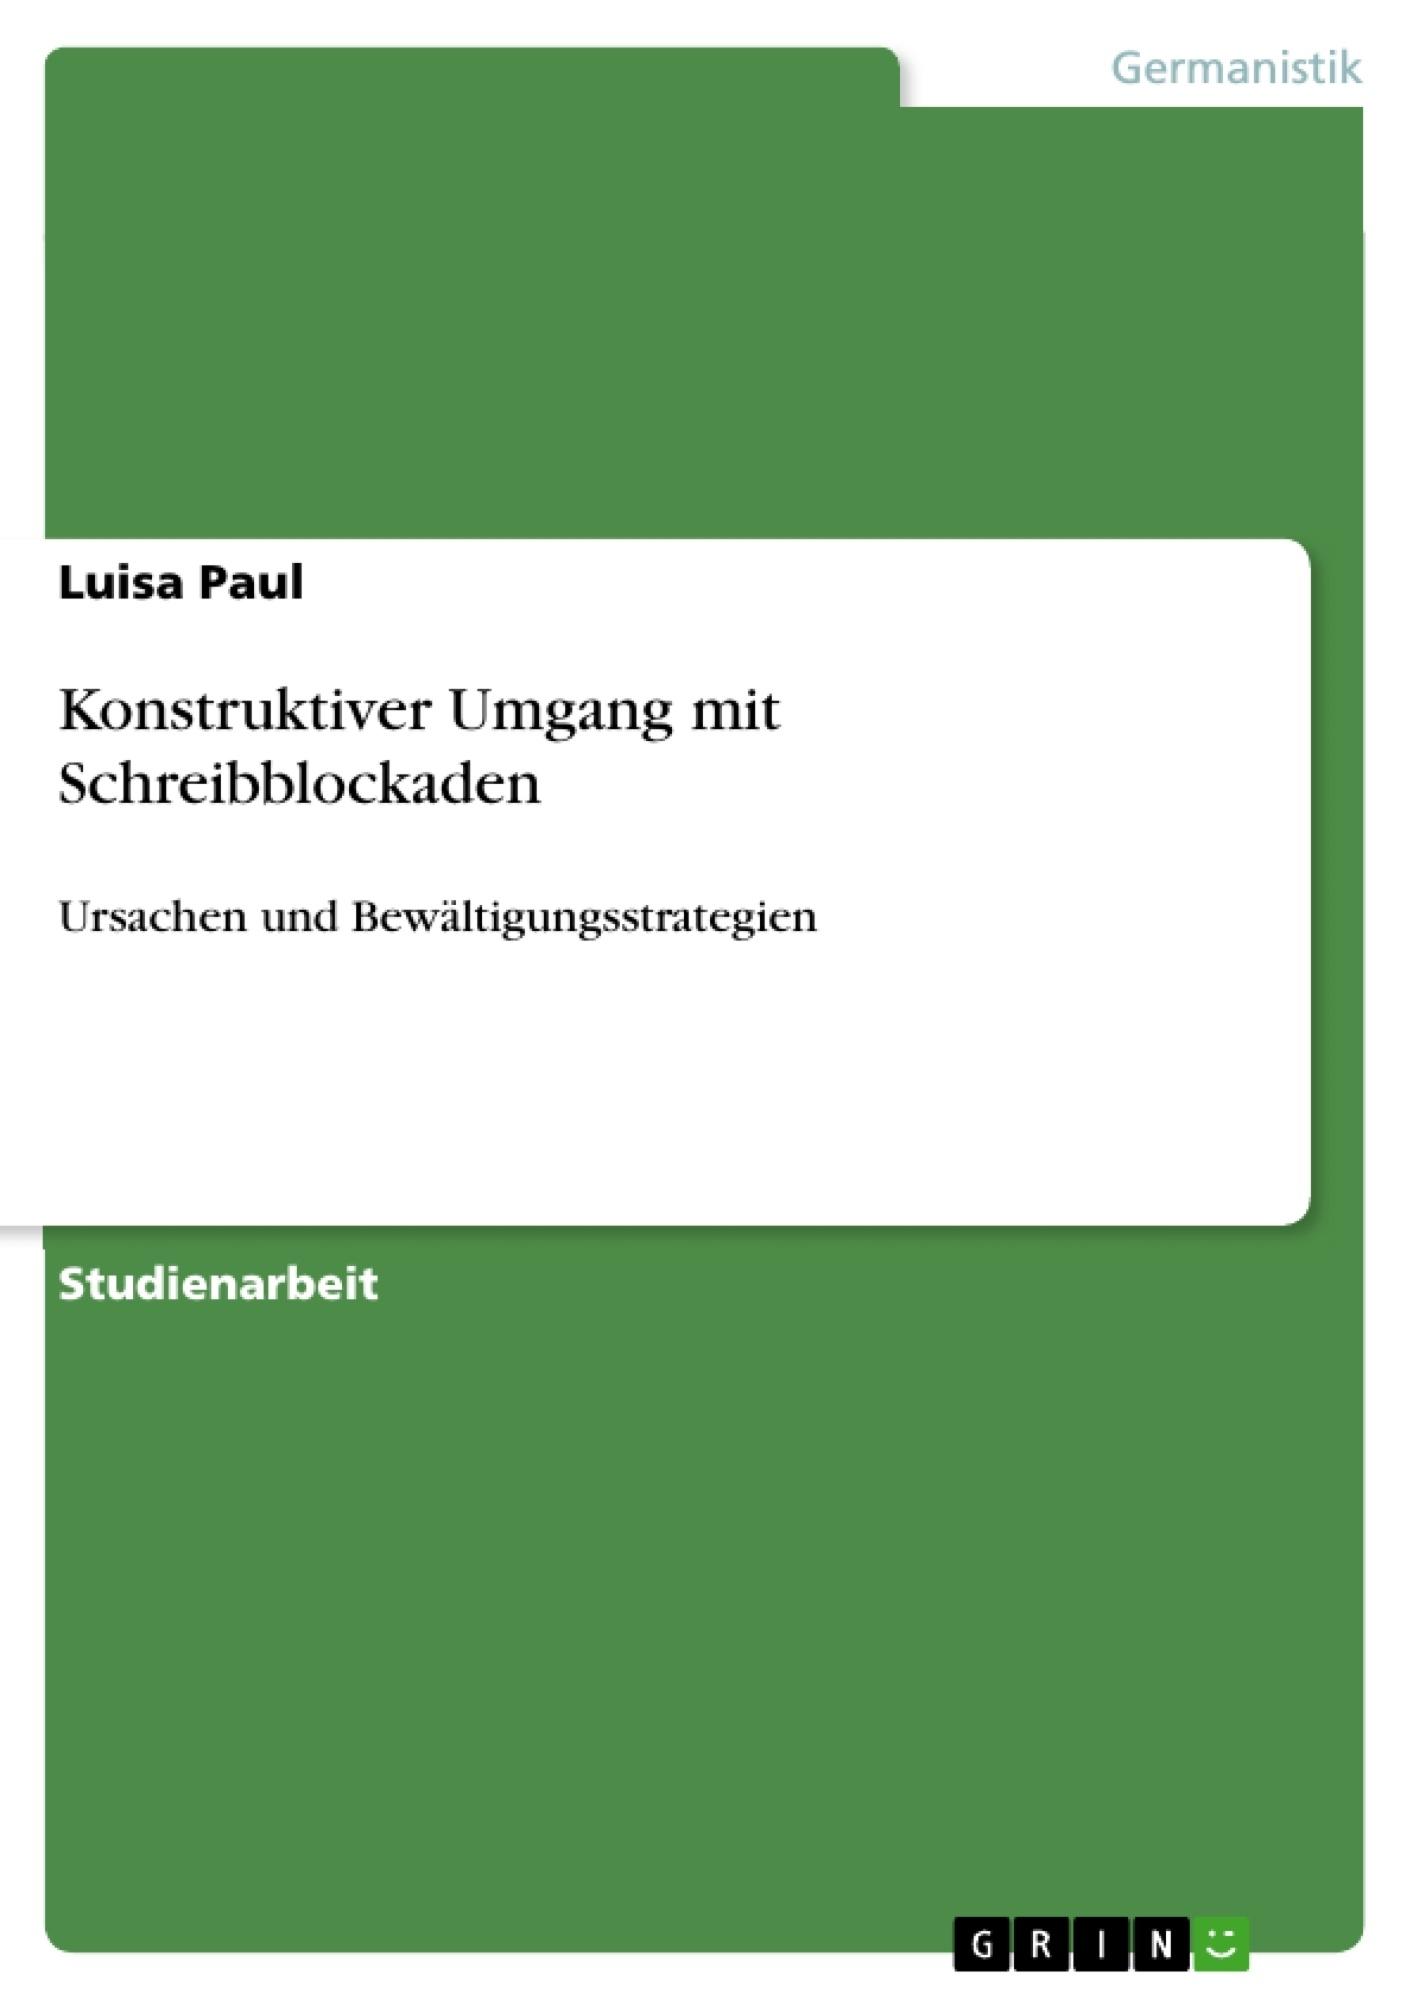 Titel: Konstruktiver Umgang mit Schreibblockaden